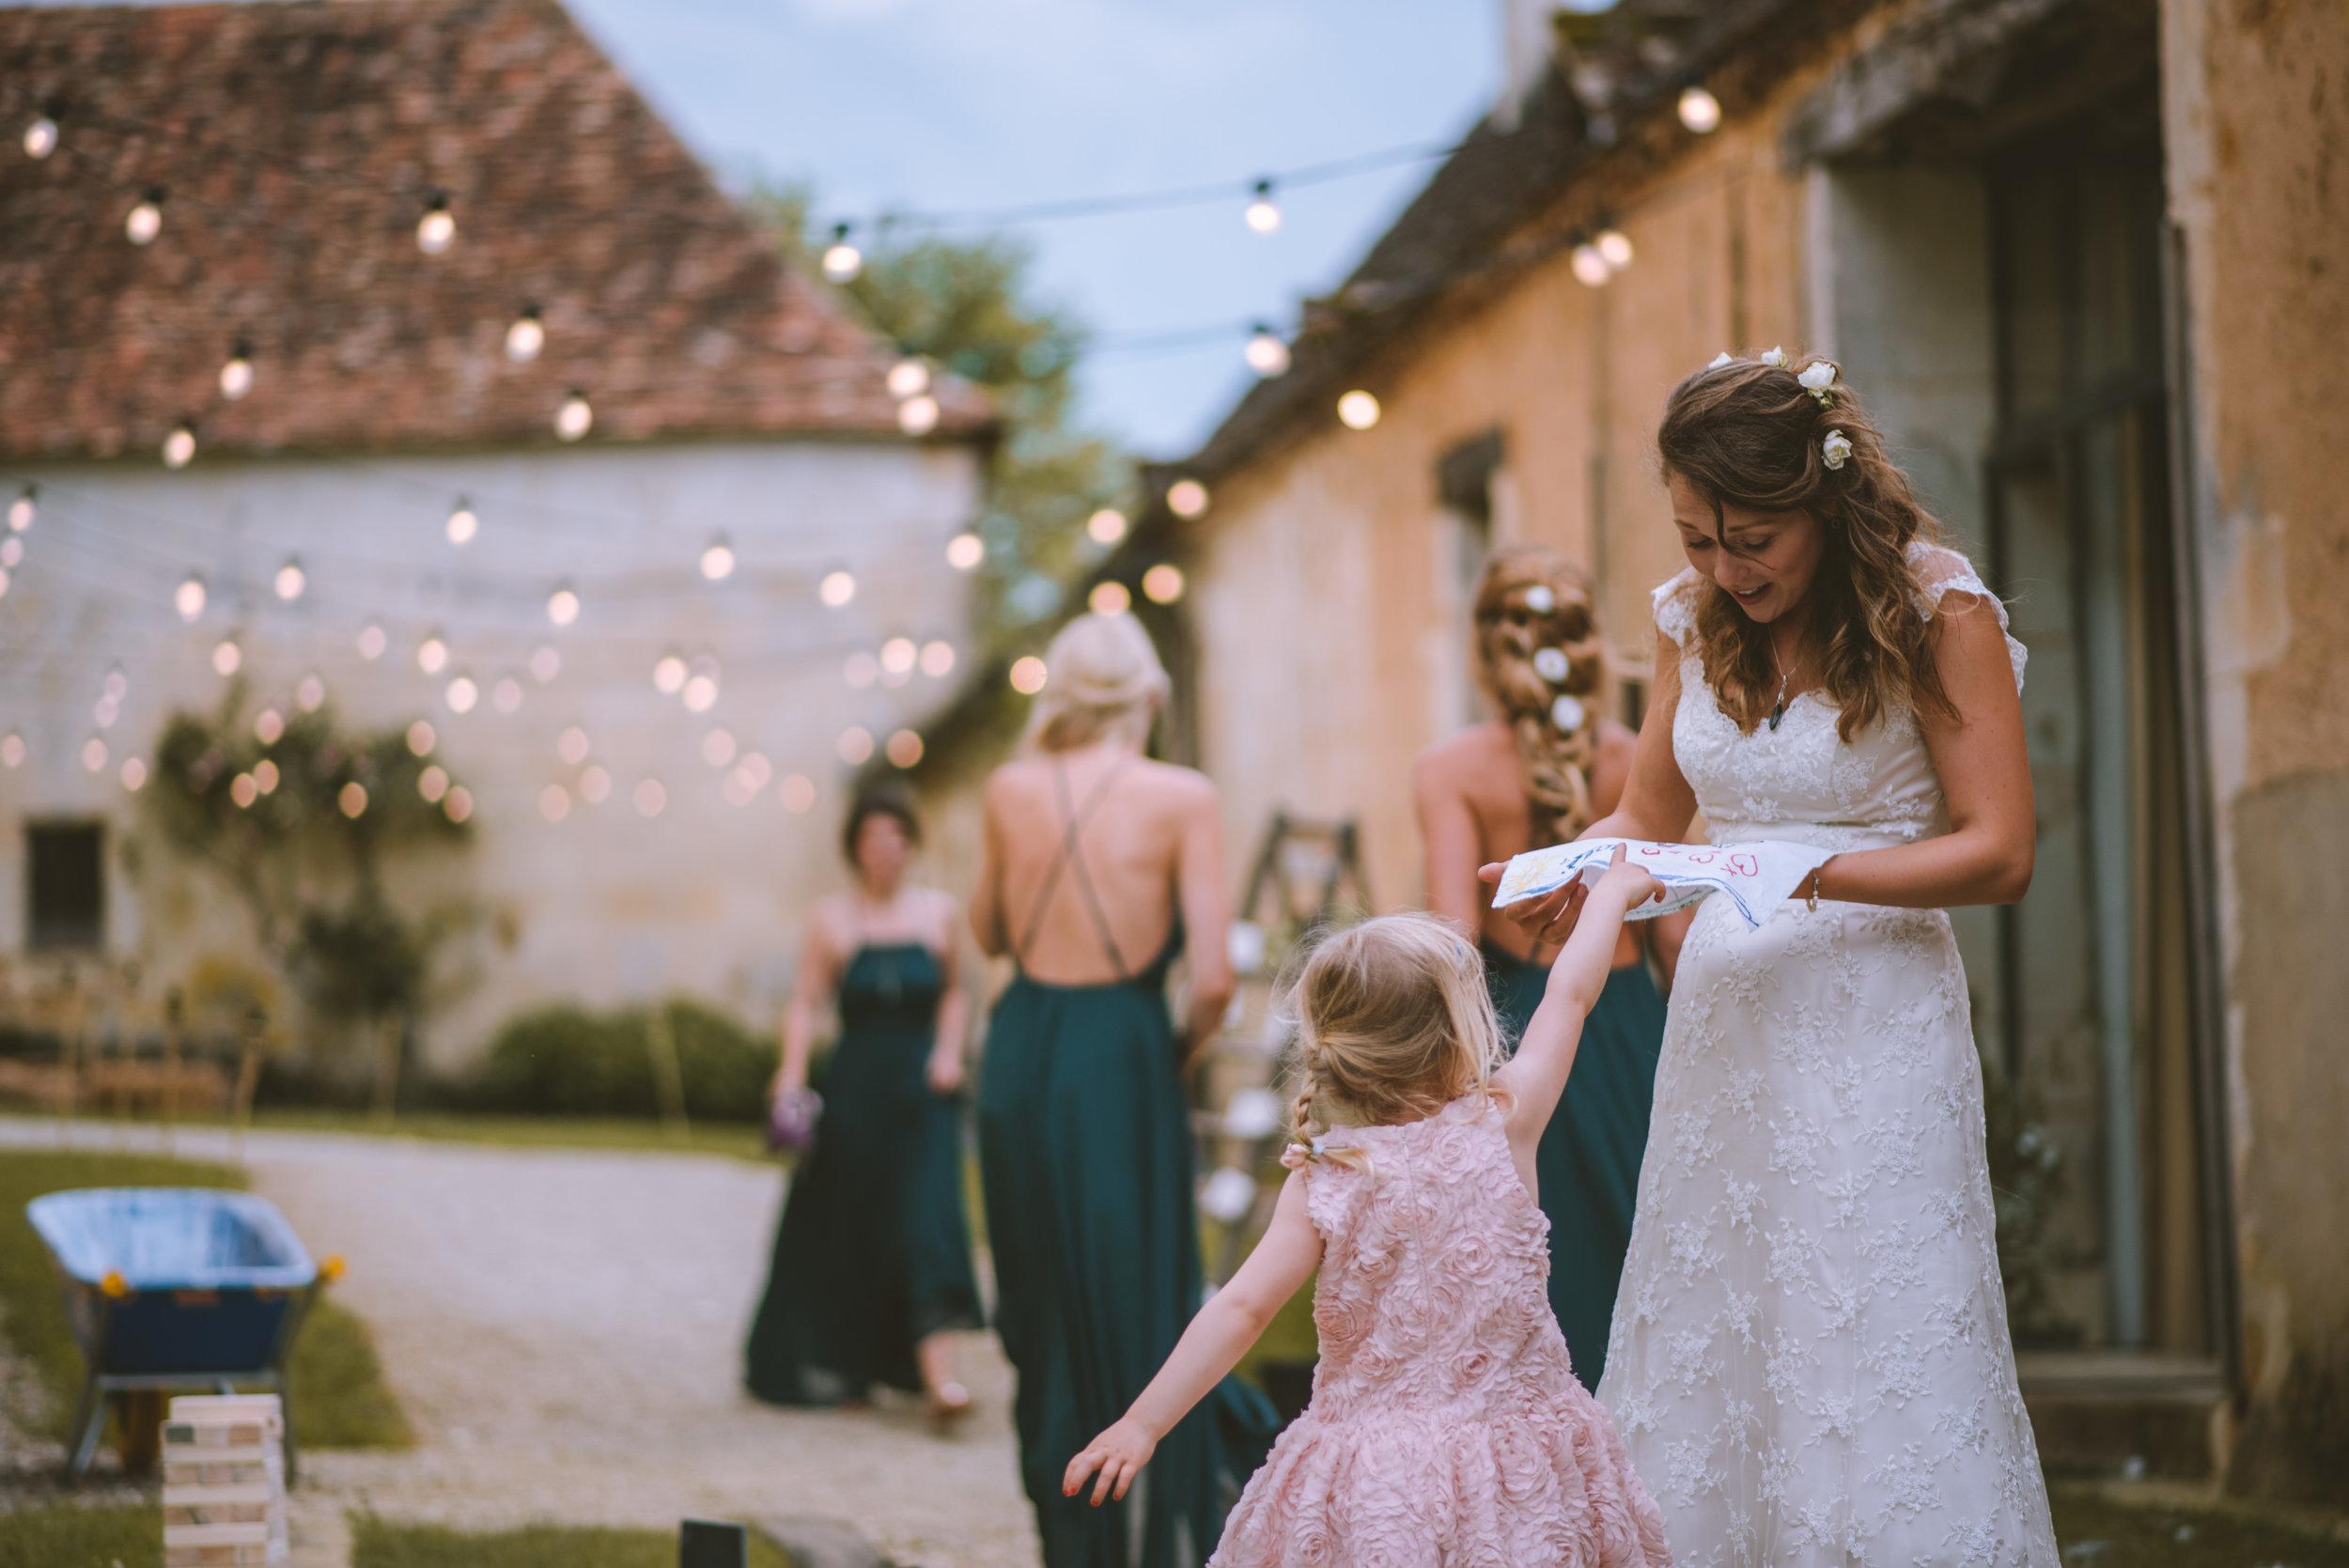 wedding-photographer-dordogne-mark-shaw-50.jpg